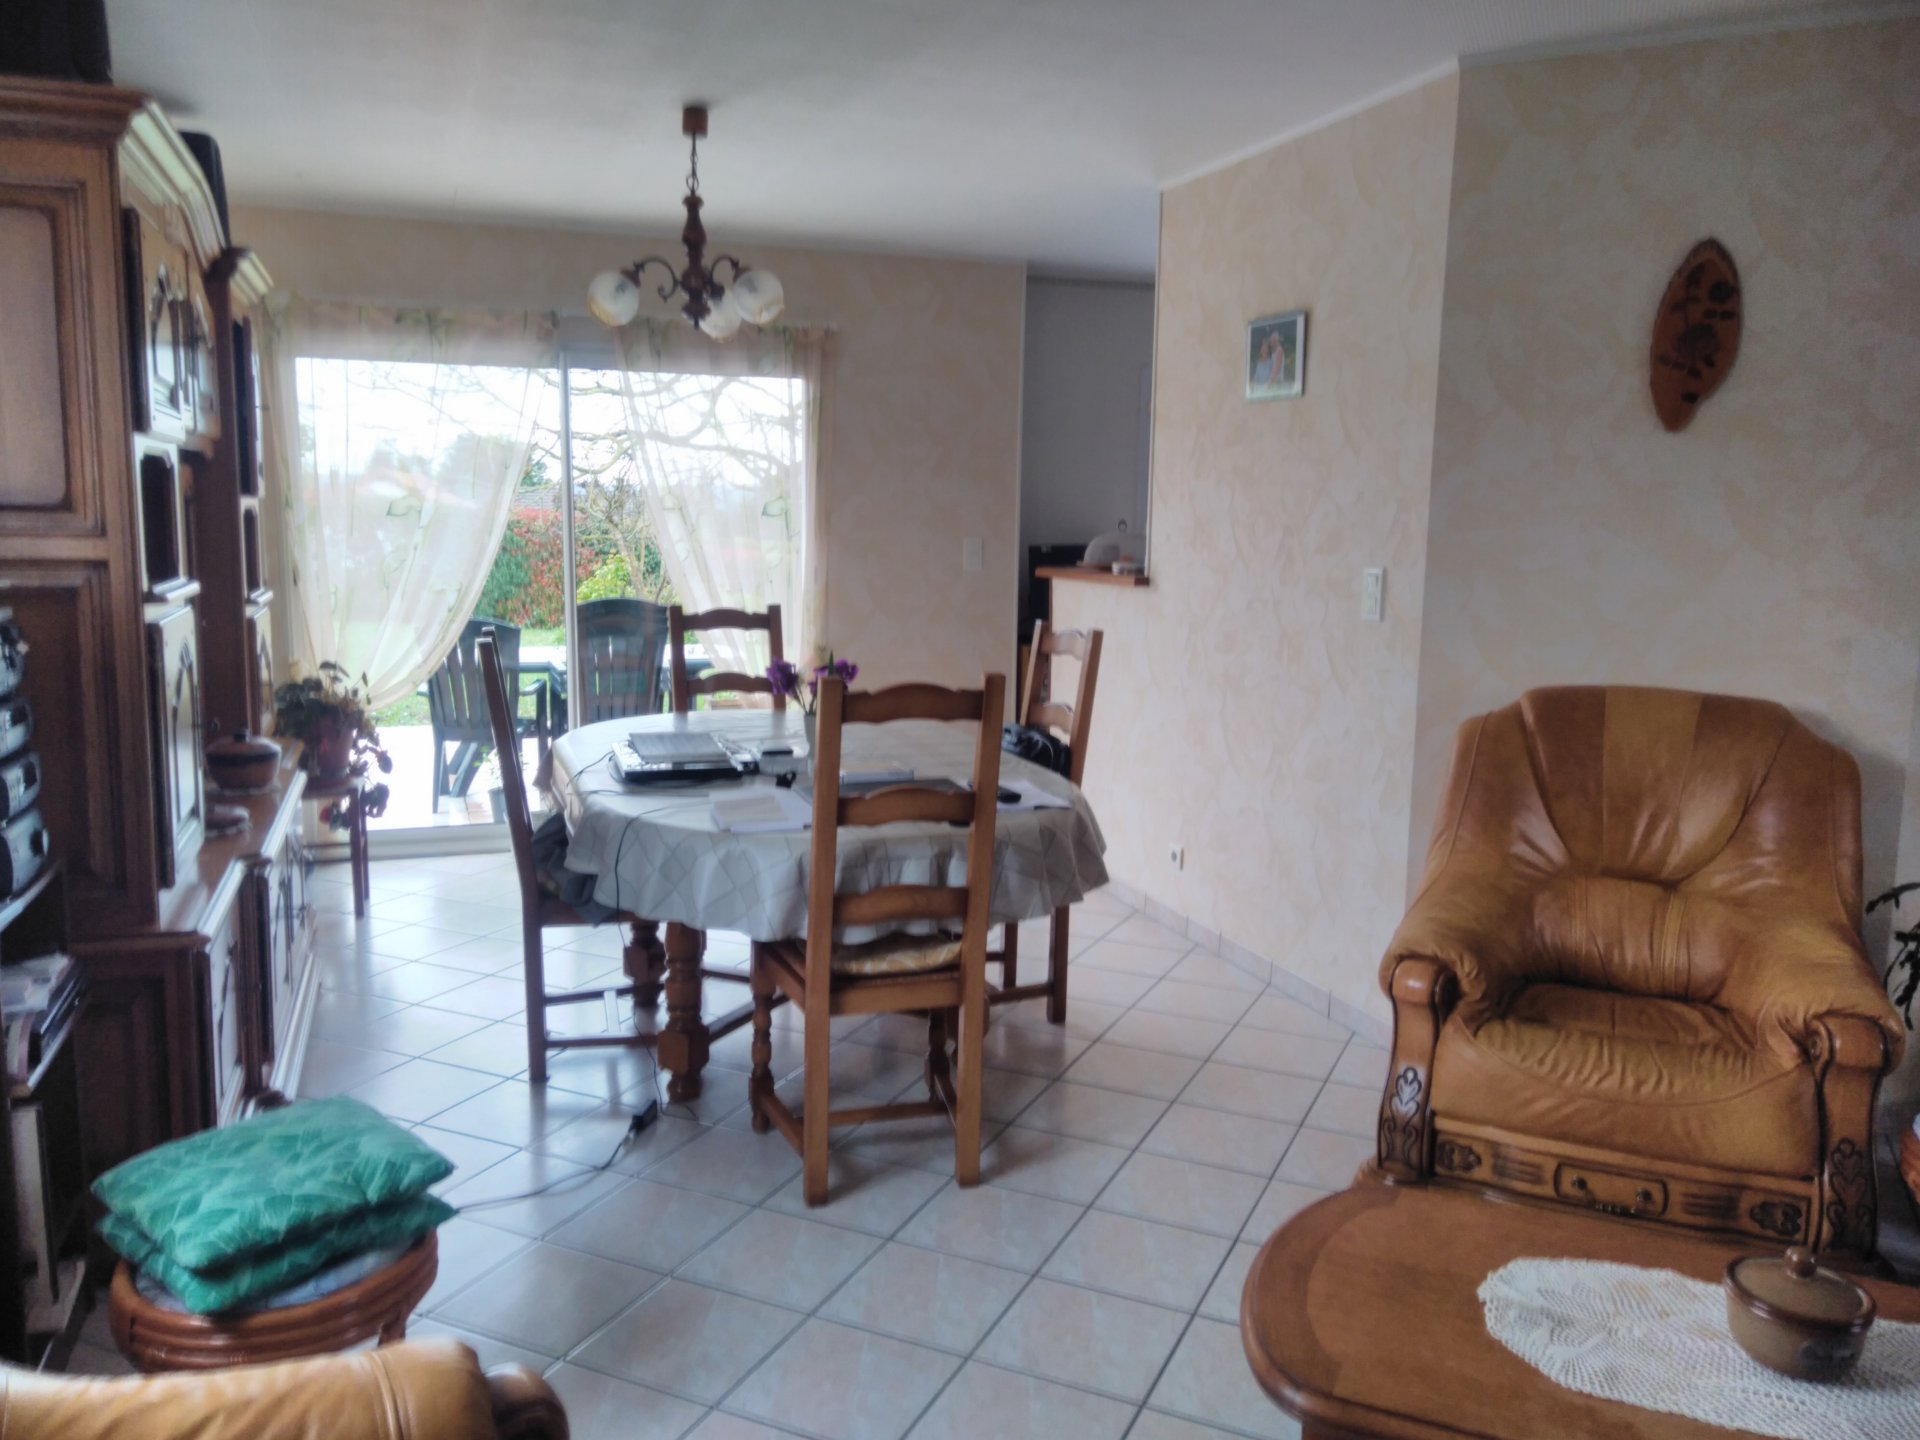 5678VBM - Maison - Sortie VICHY